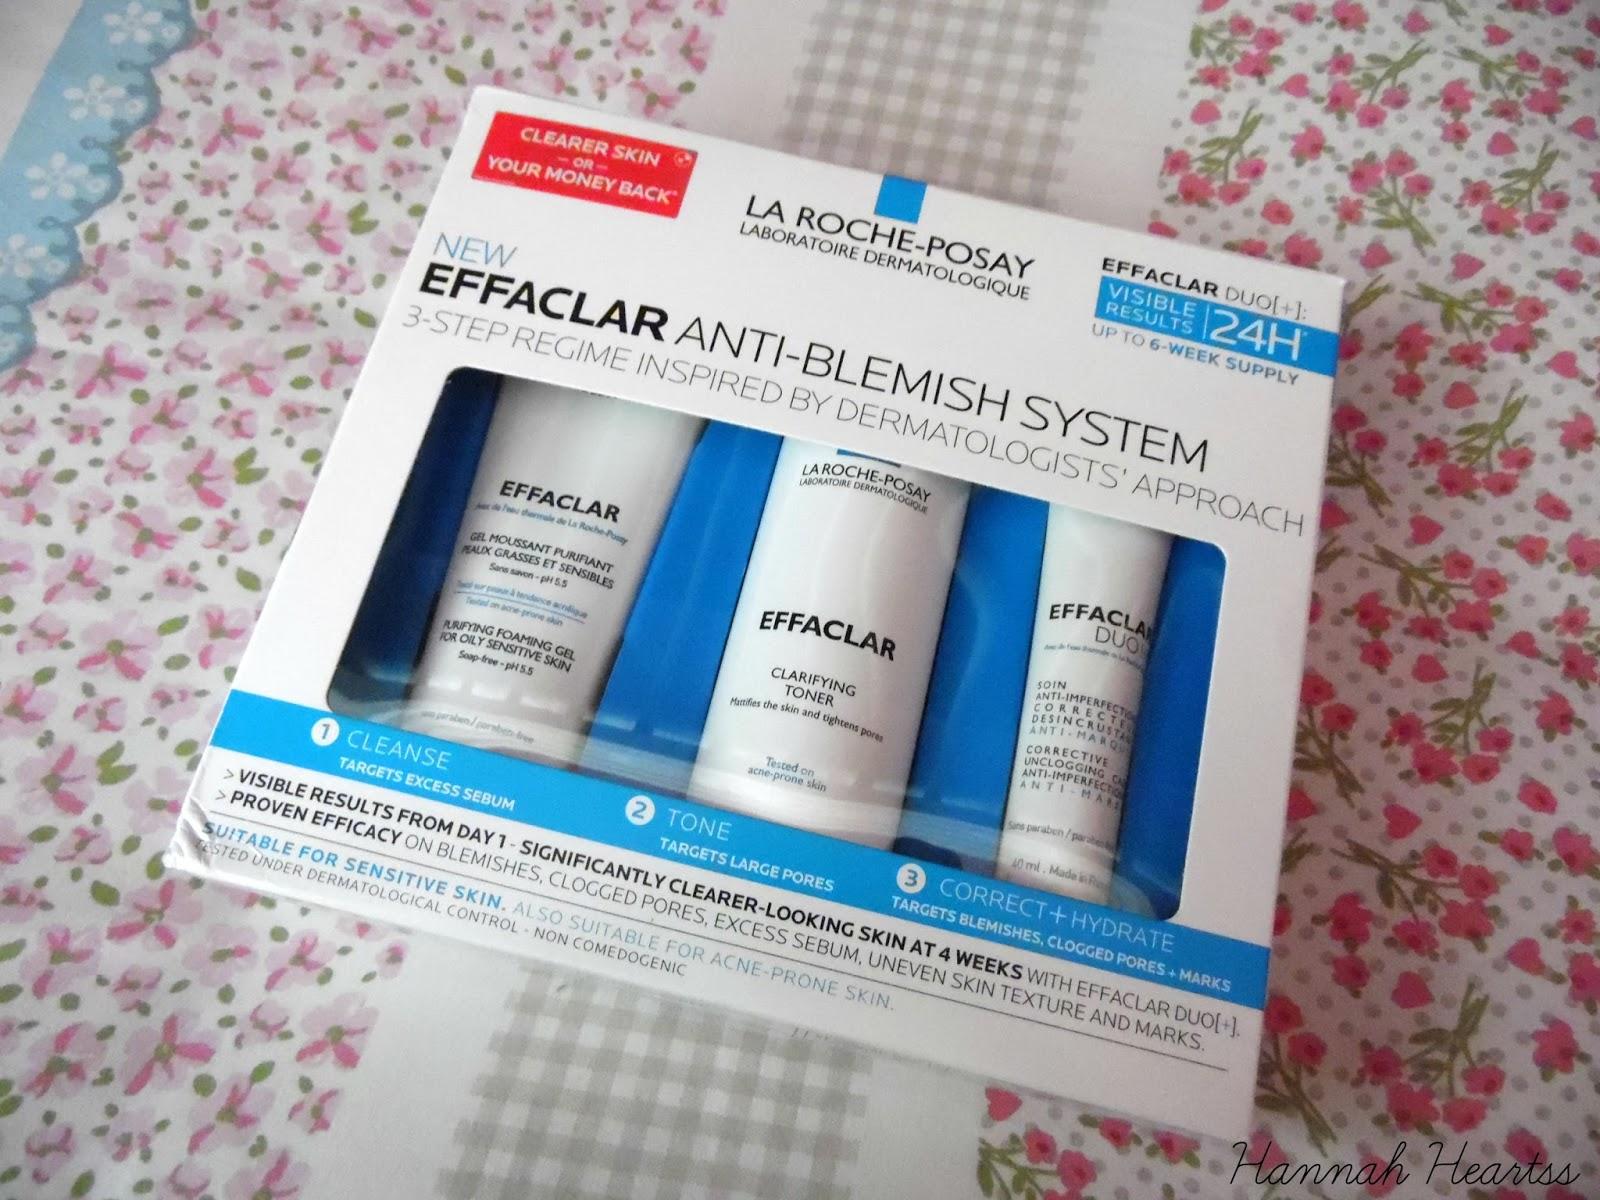 La Roche Posay Effaclar 3 Step Anti-Blemish System